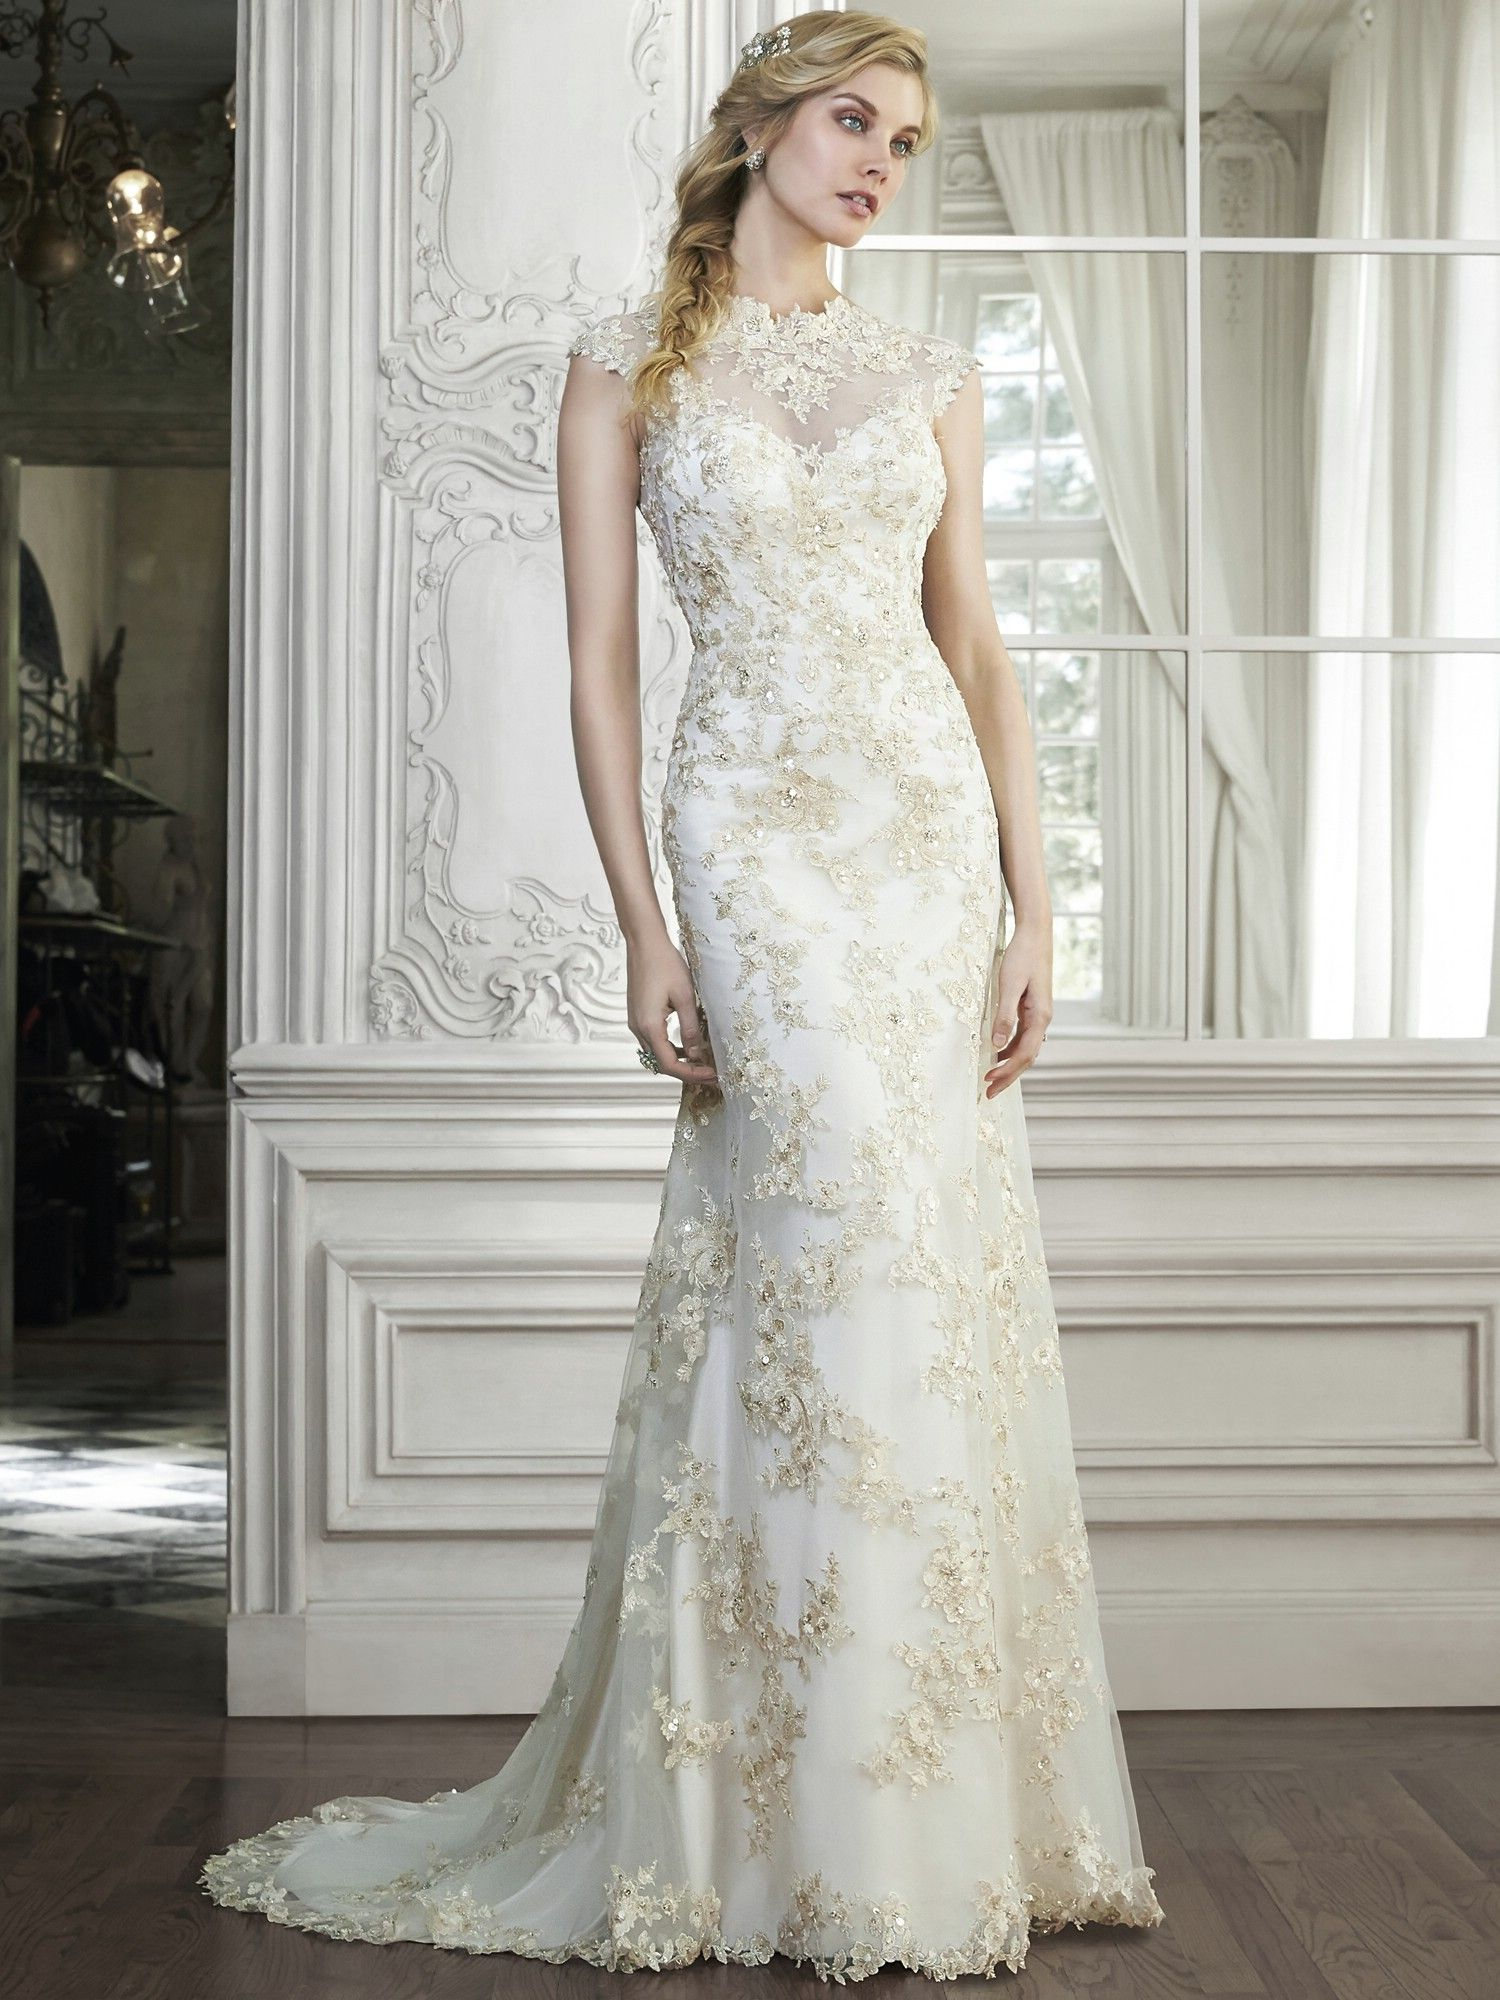 Maggie Sottero Wedding Dresses Style Camelia 5mr132 1 998 00